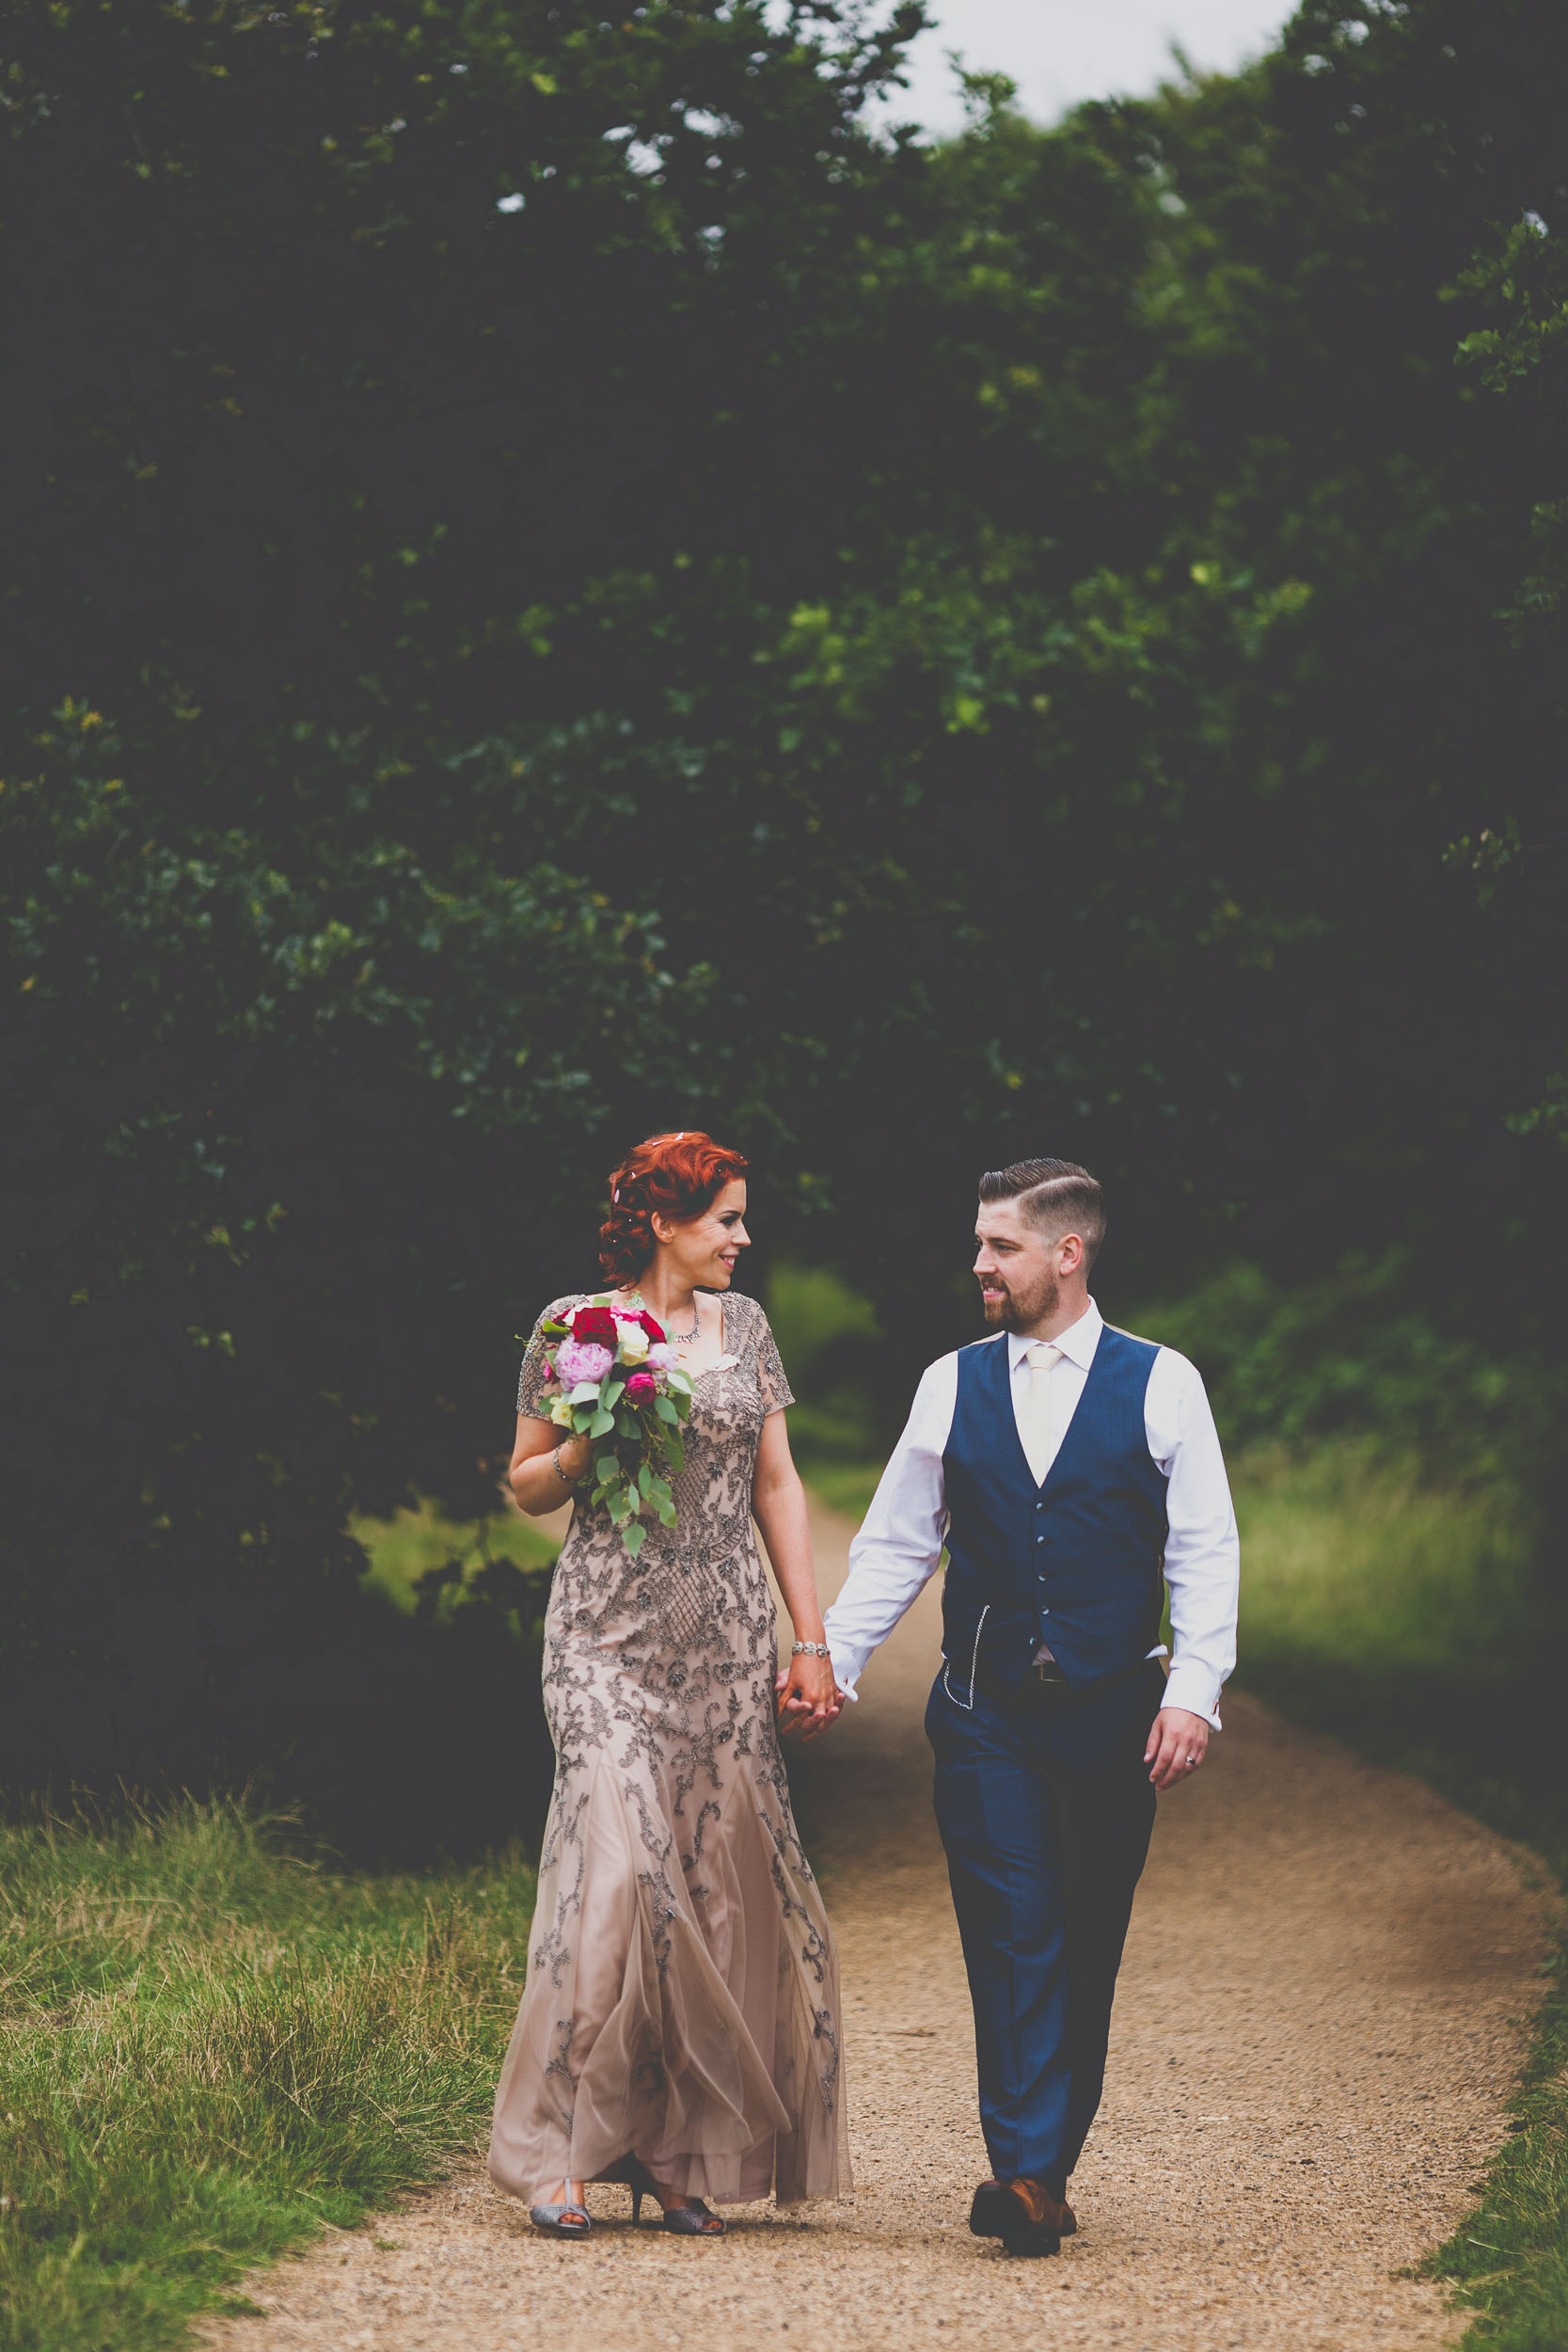 queen-elizabeths-hunting-lodge-epping-forest-wedding256.jpg